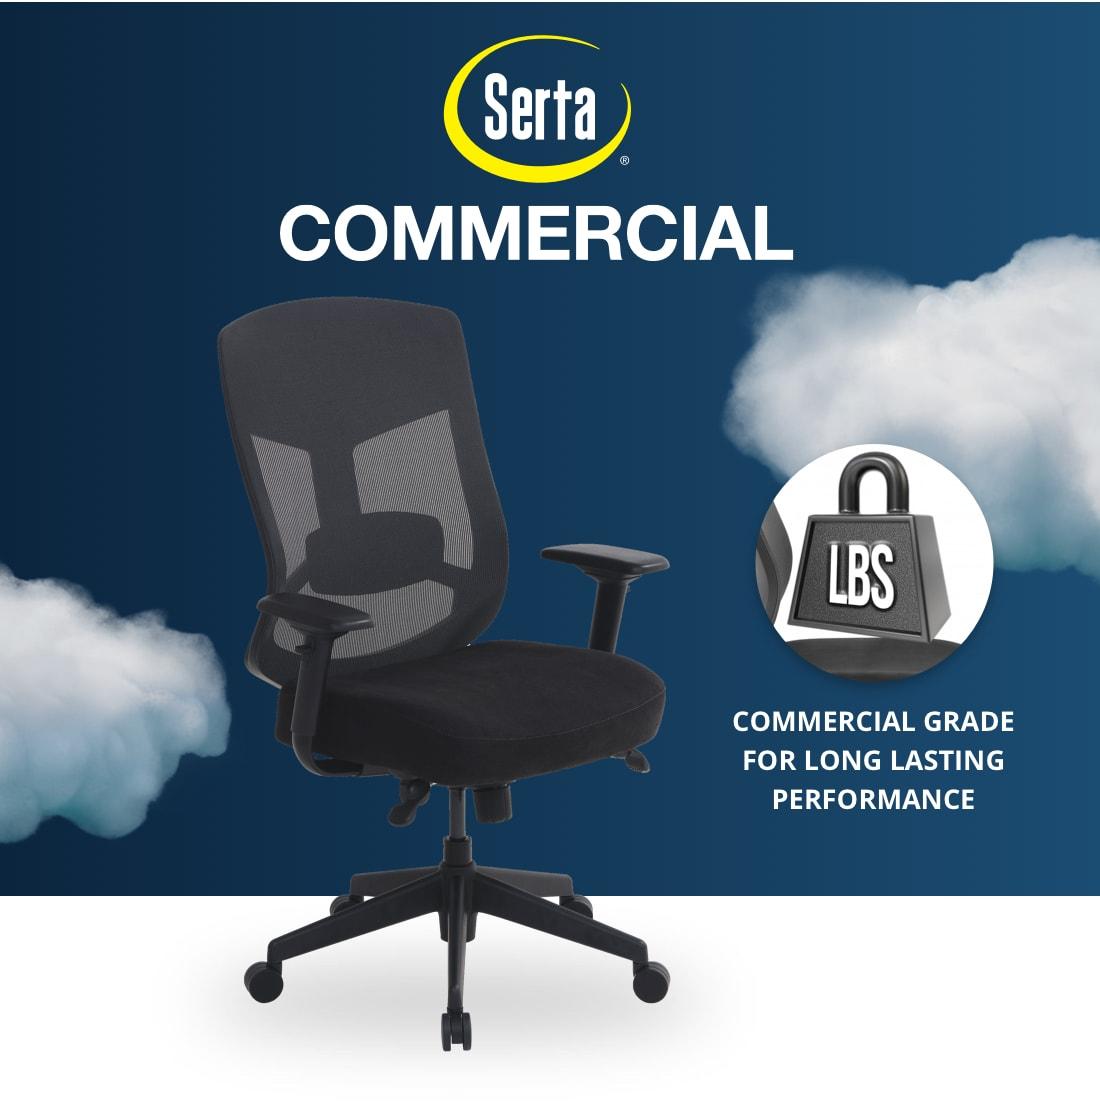 Serta Commercial